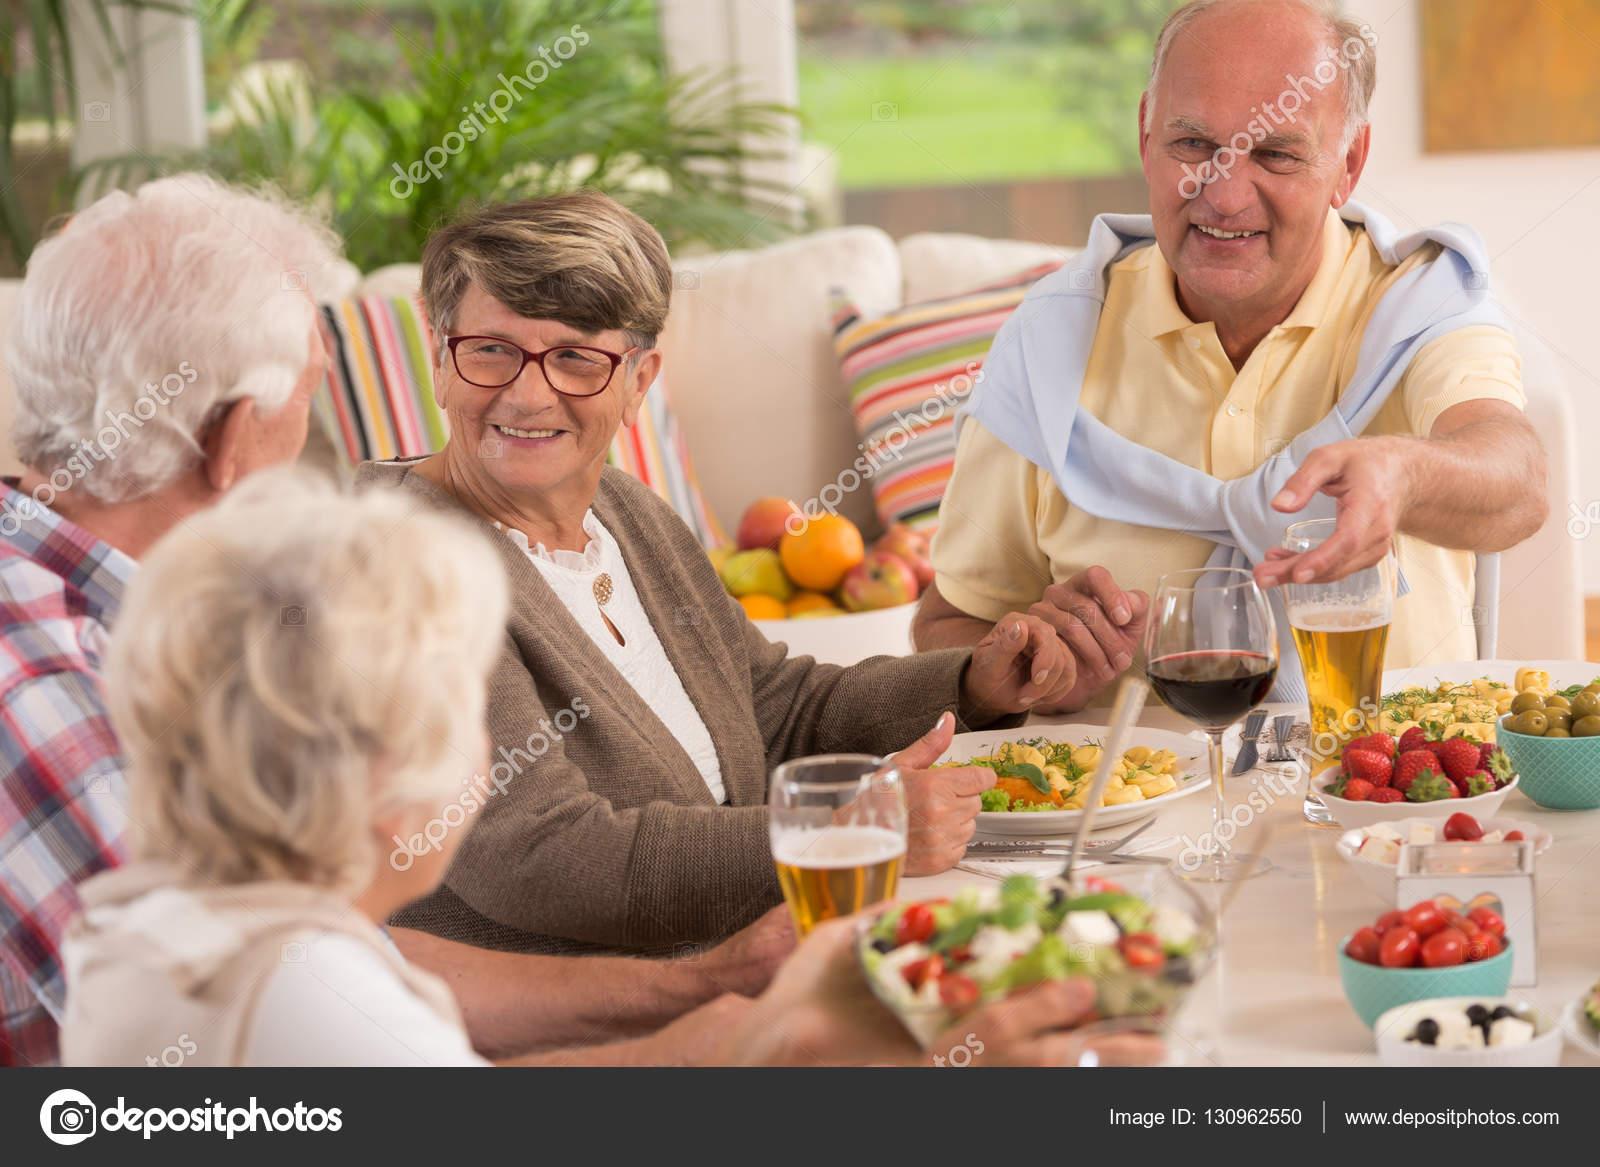 1c4ff85bfe50 Seniors απολαμβάνοντας ένα βραδινό γεύμα — Φωτογραφία Αρχείου ...